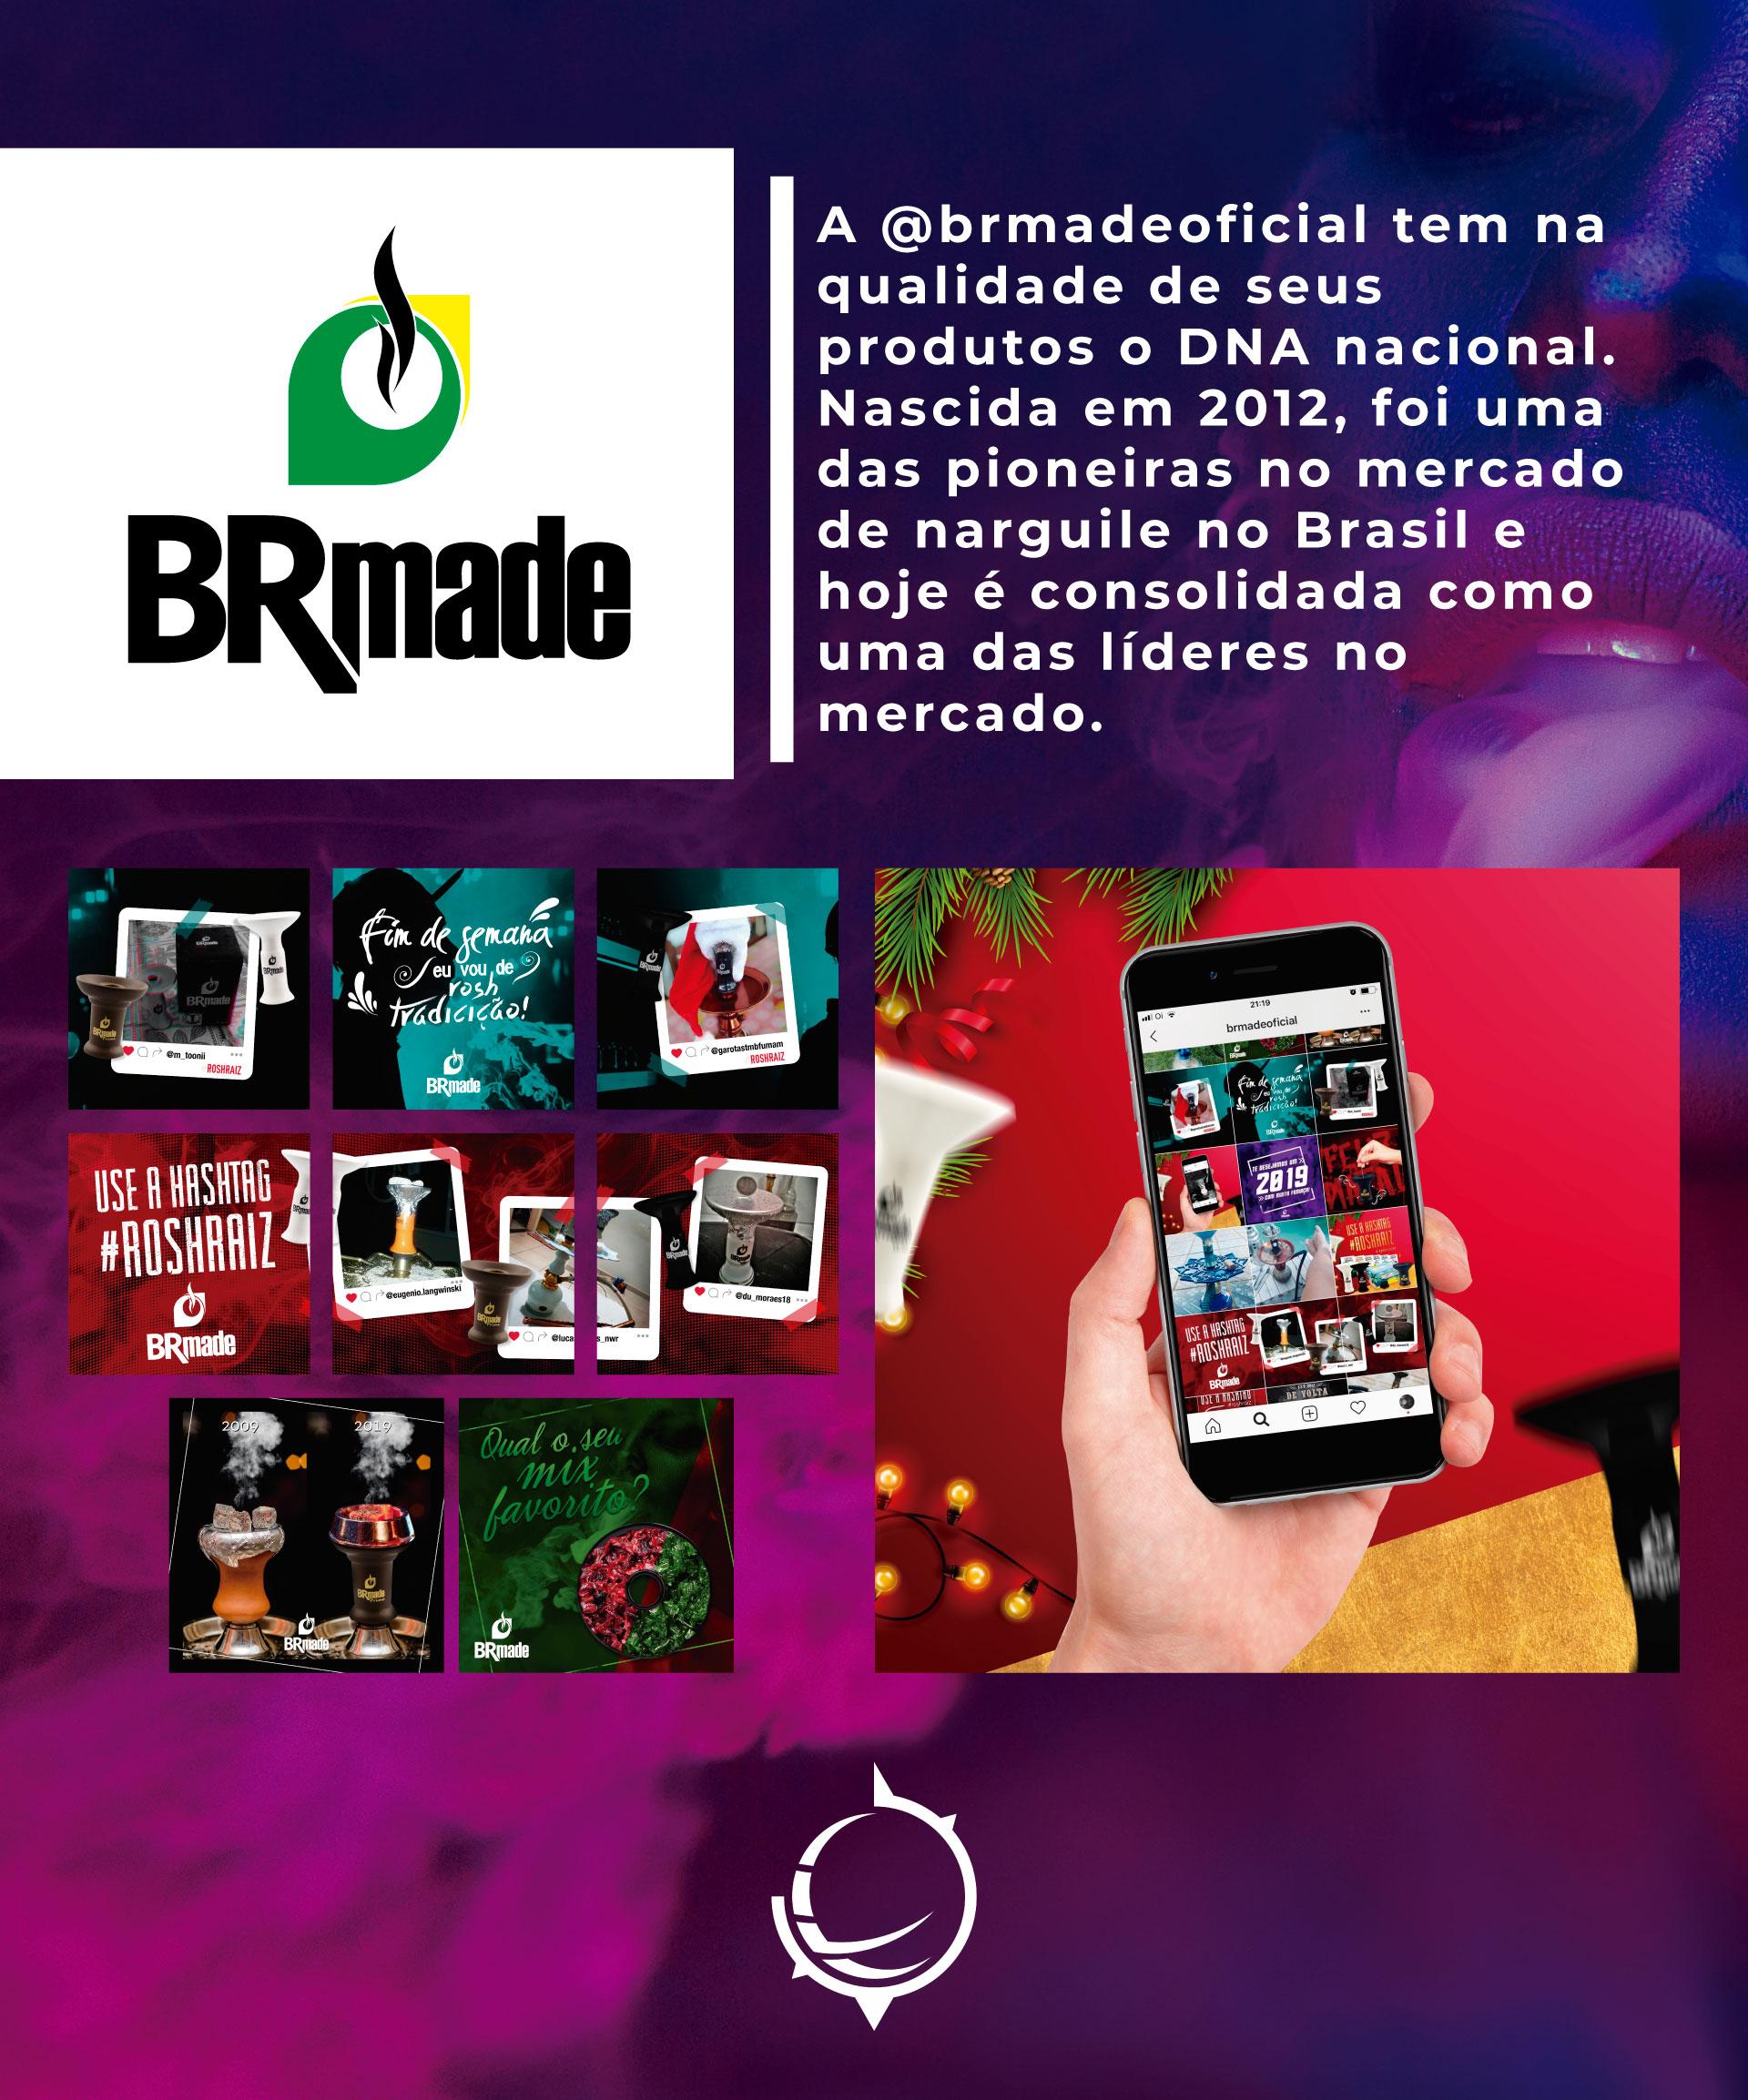 BRmade